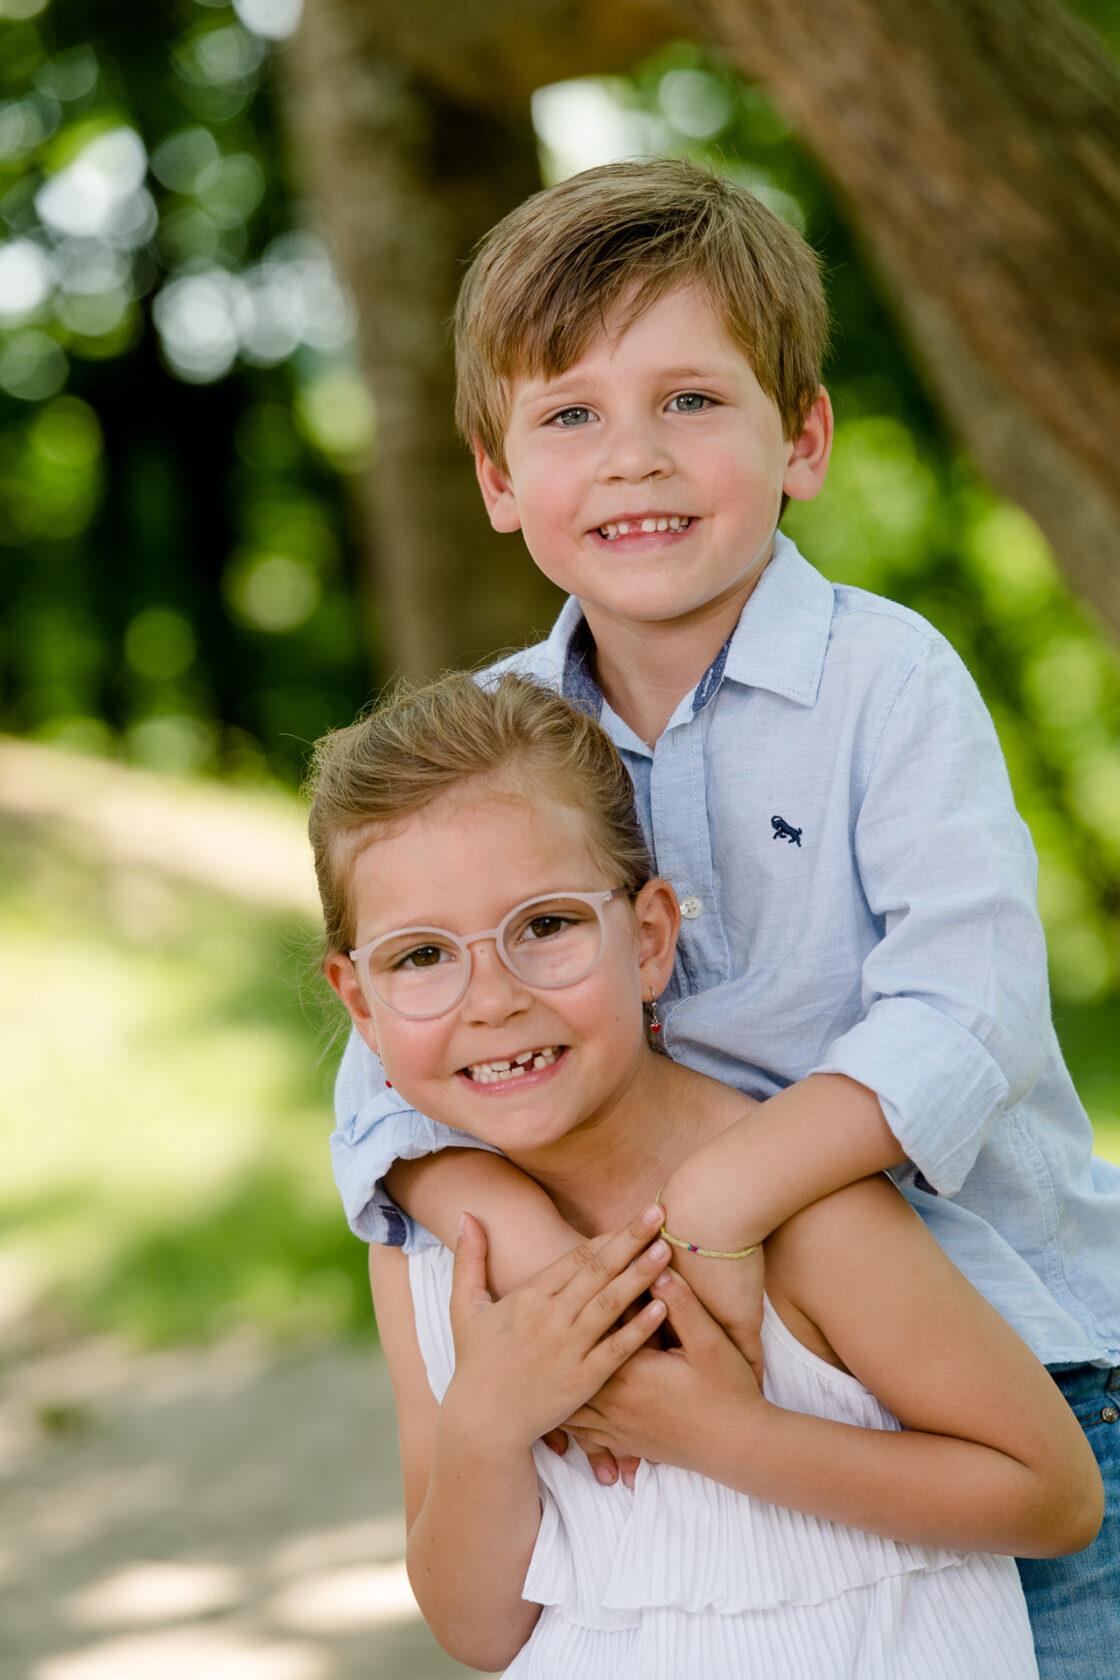 Kindergartenfotografie - Geschwister